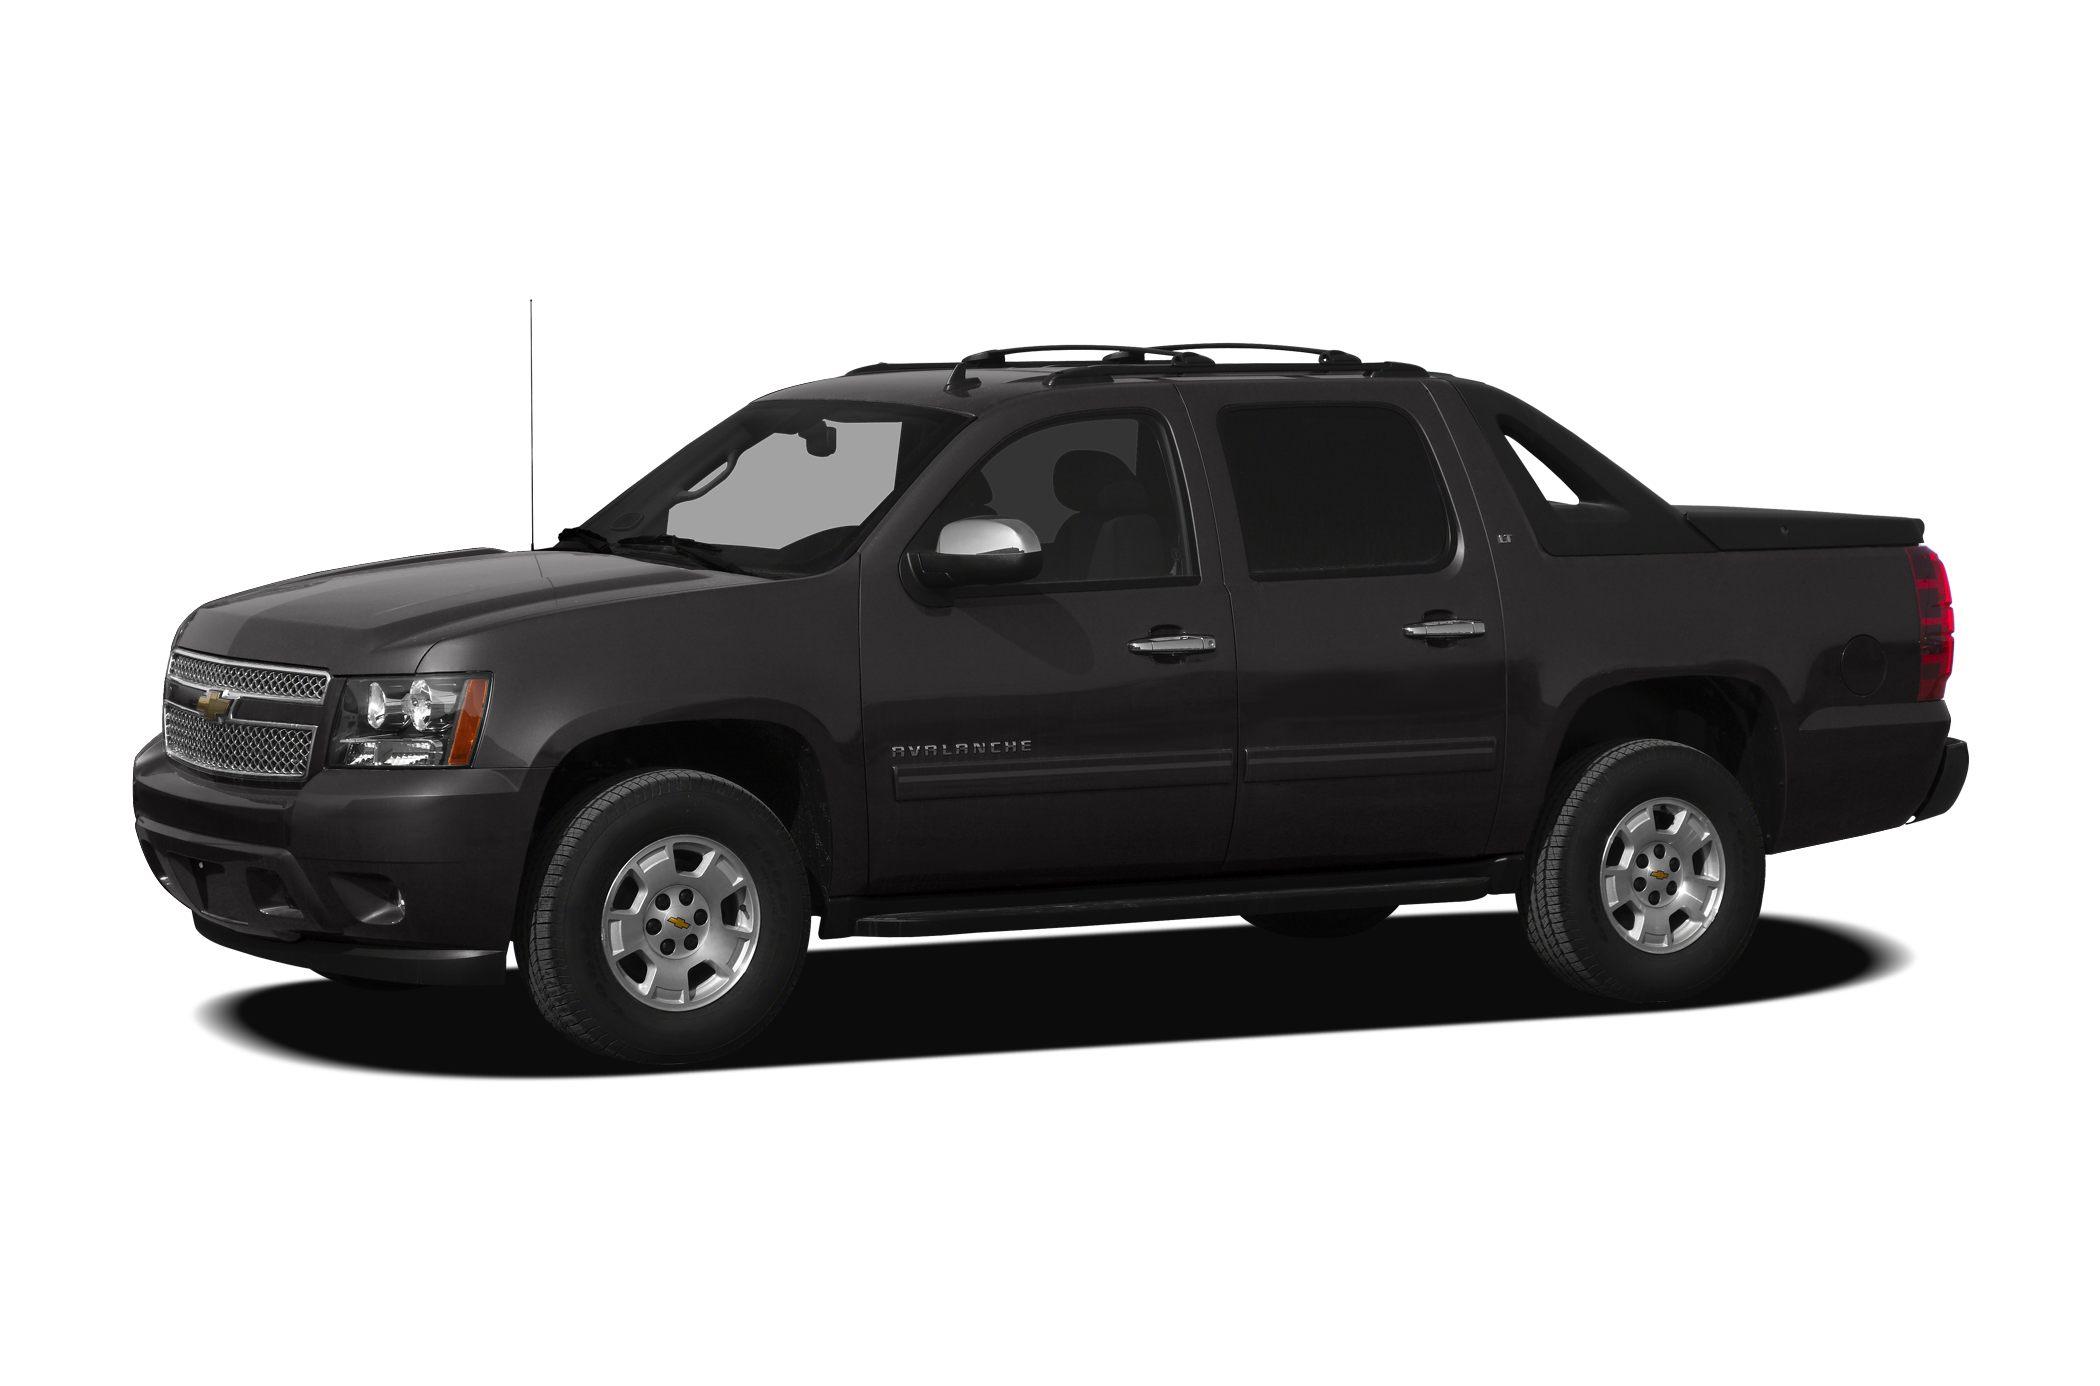 2012 Chevrolet Avalanche 1500